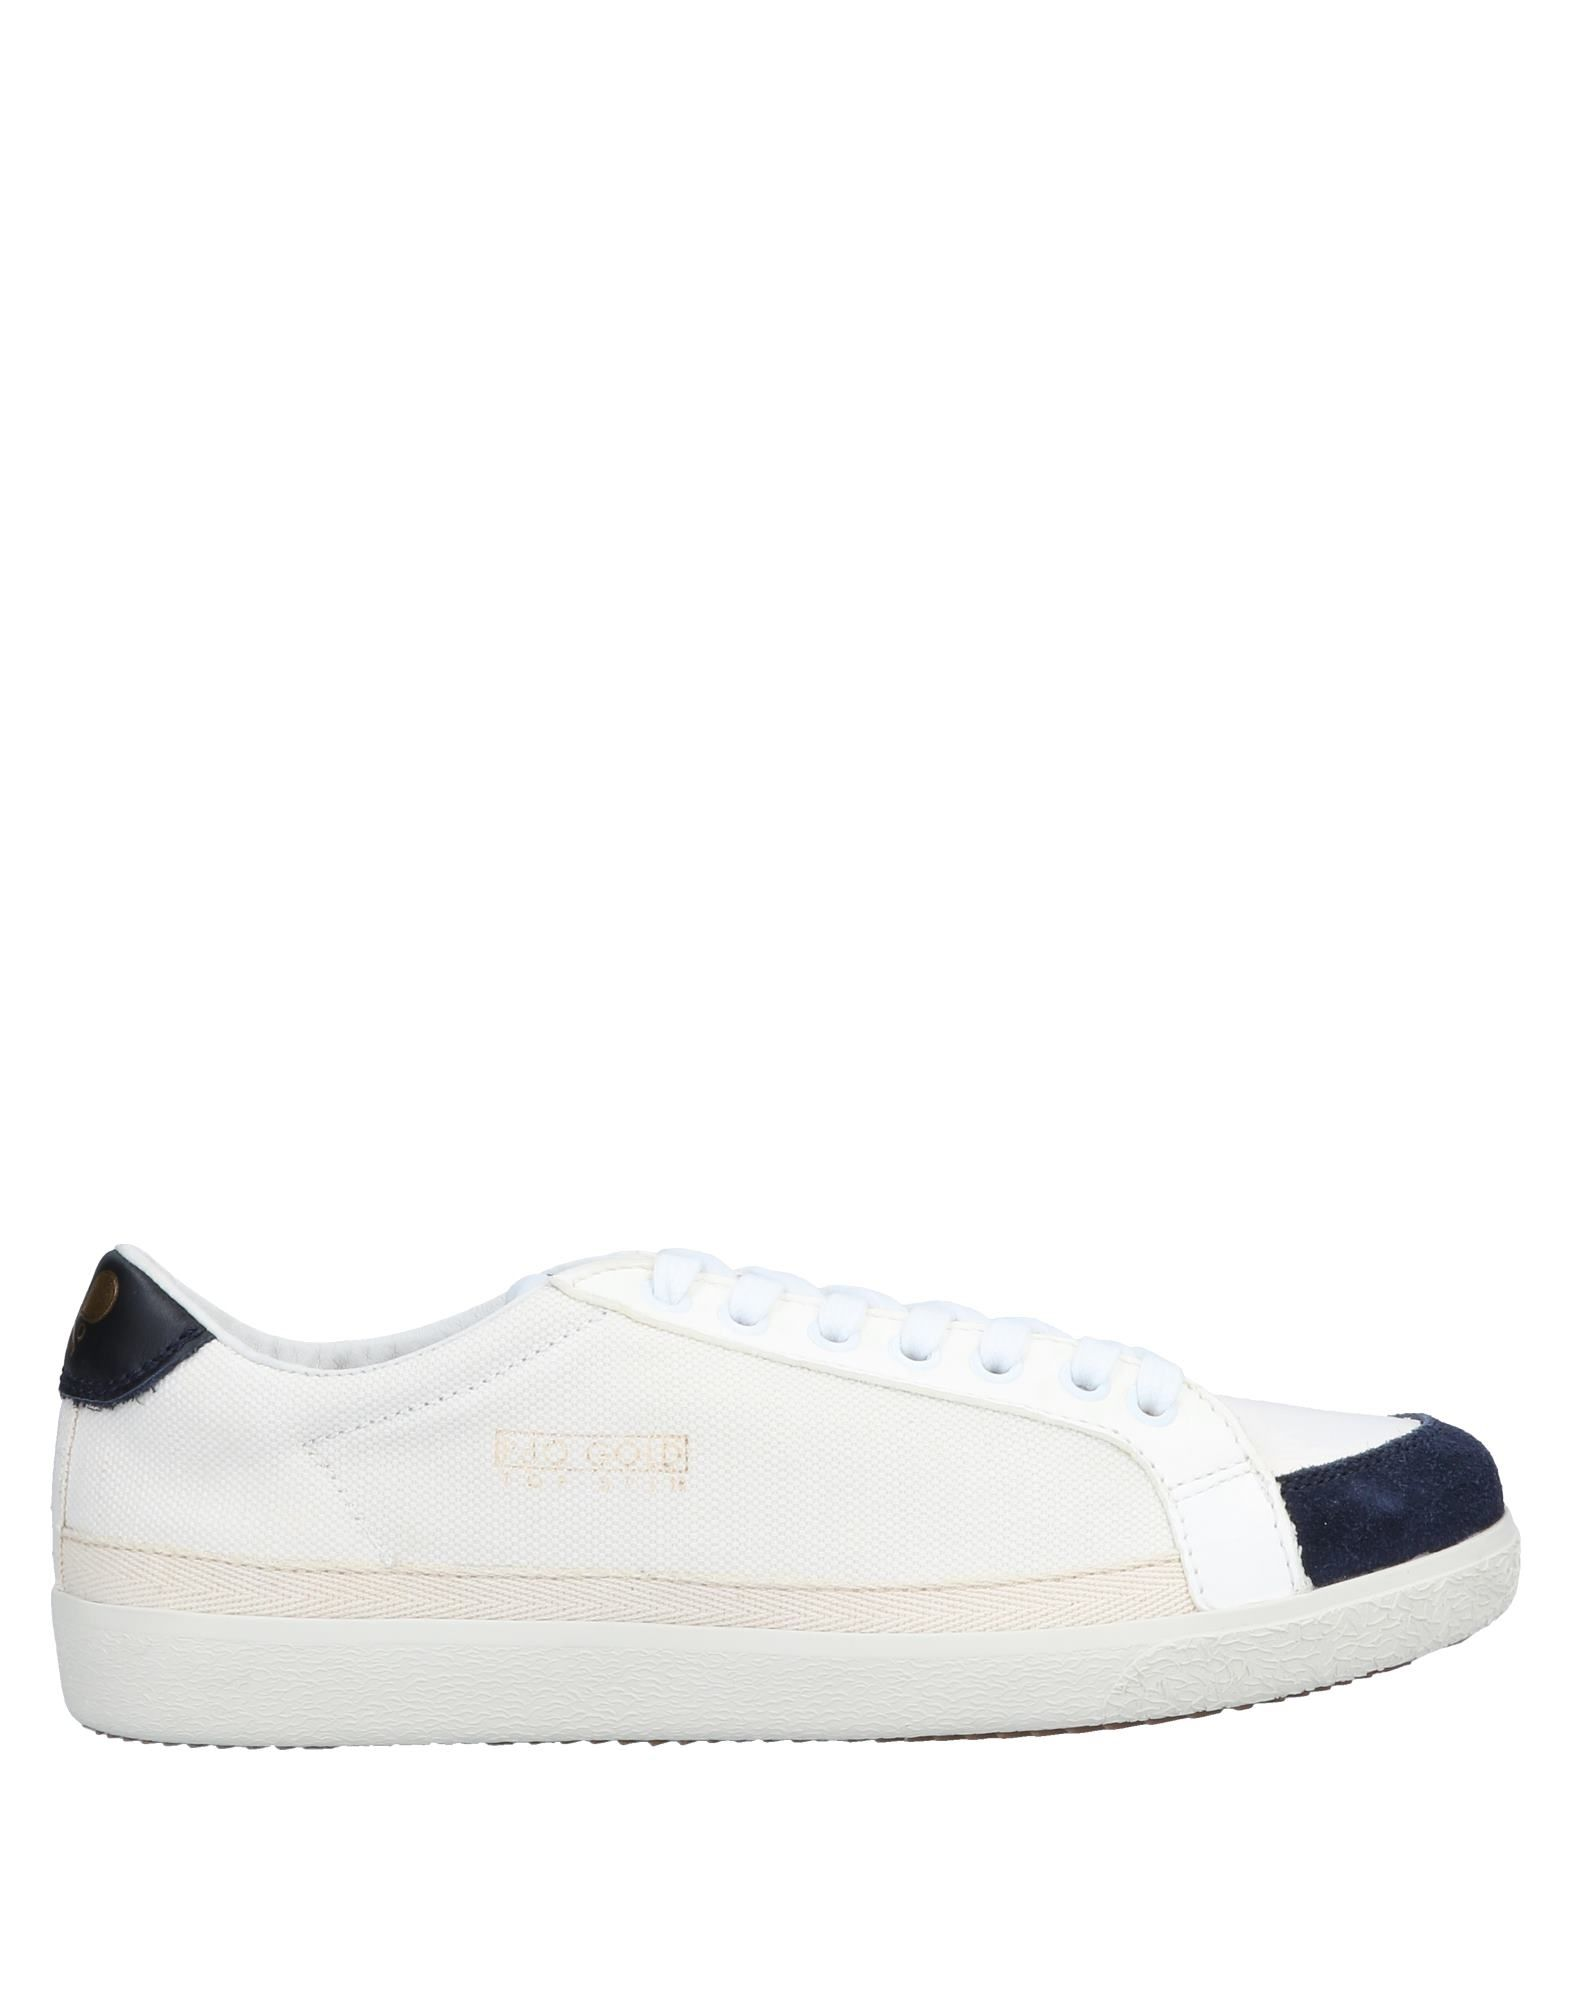 Pantofola D'oro D'oro Pantofola Sneakers Herren Gutes Preis-Leistungs-Verhältnis, es lohnt sich c75eb8